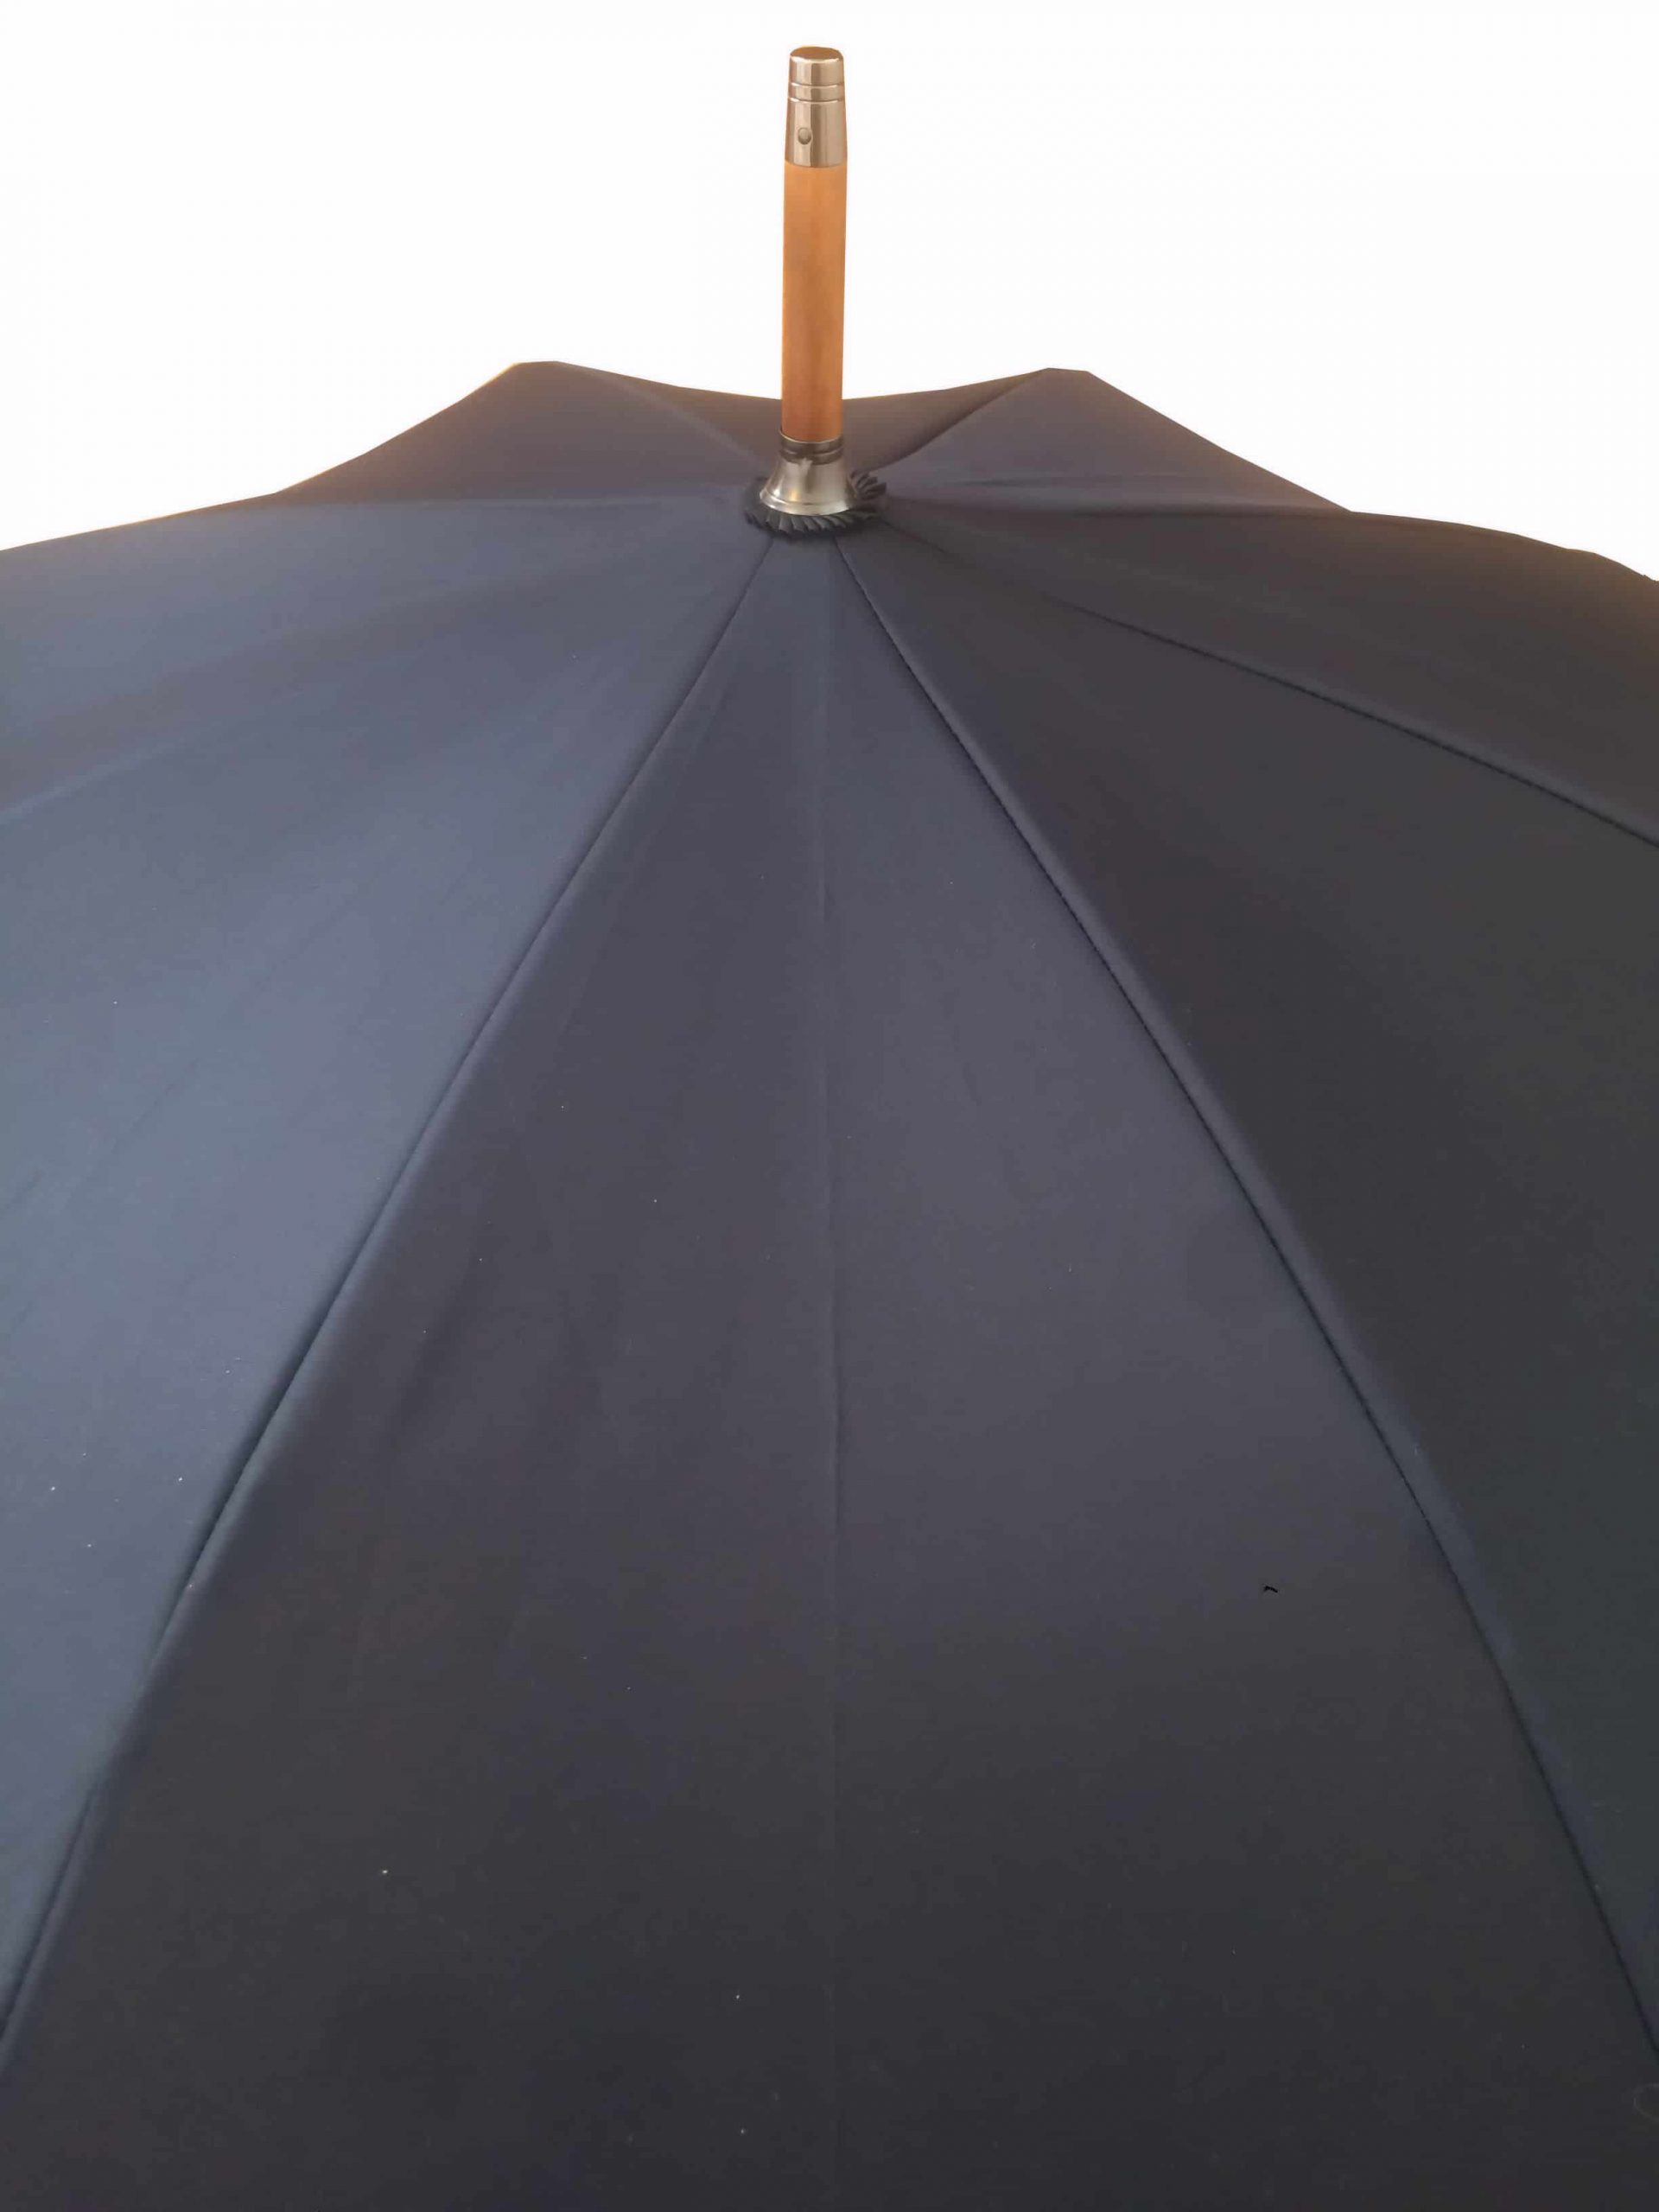 branded umbrellas cap